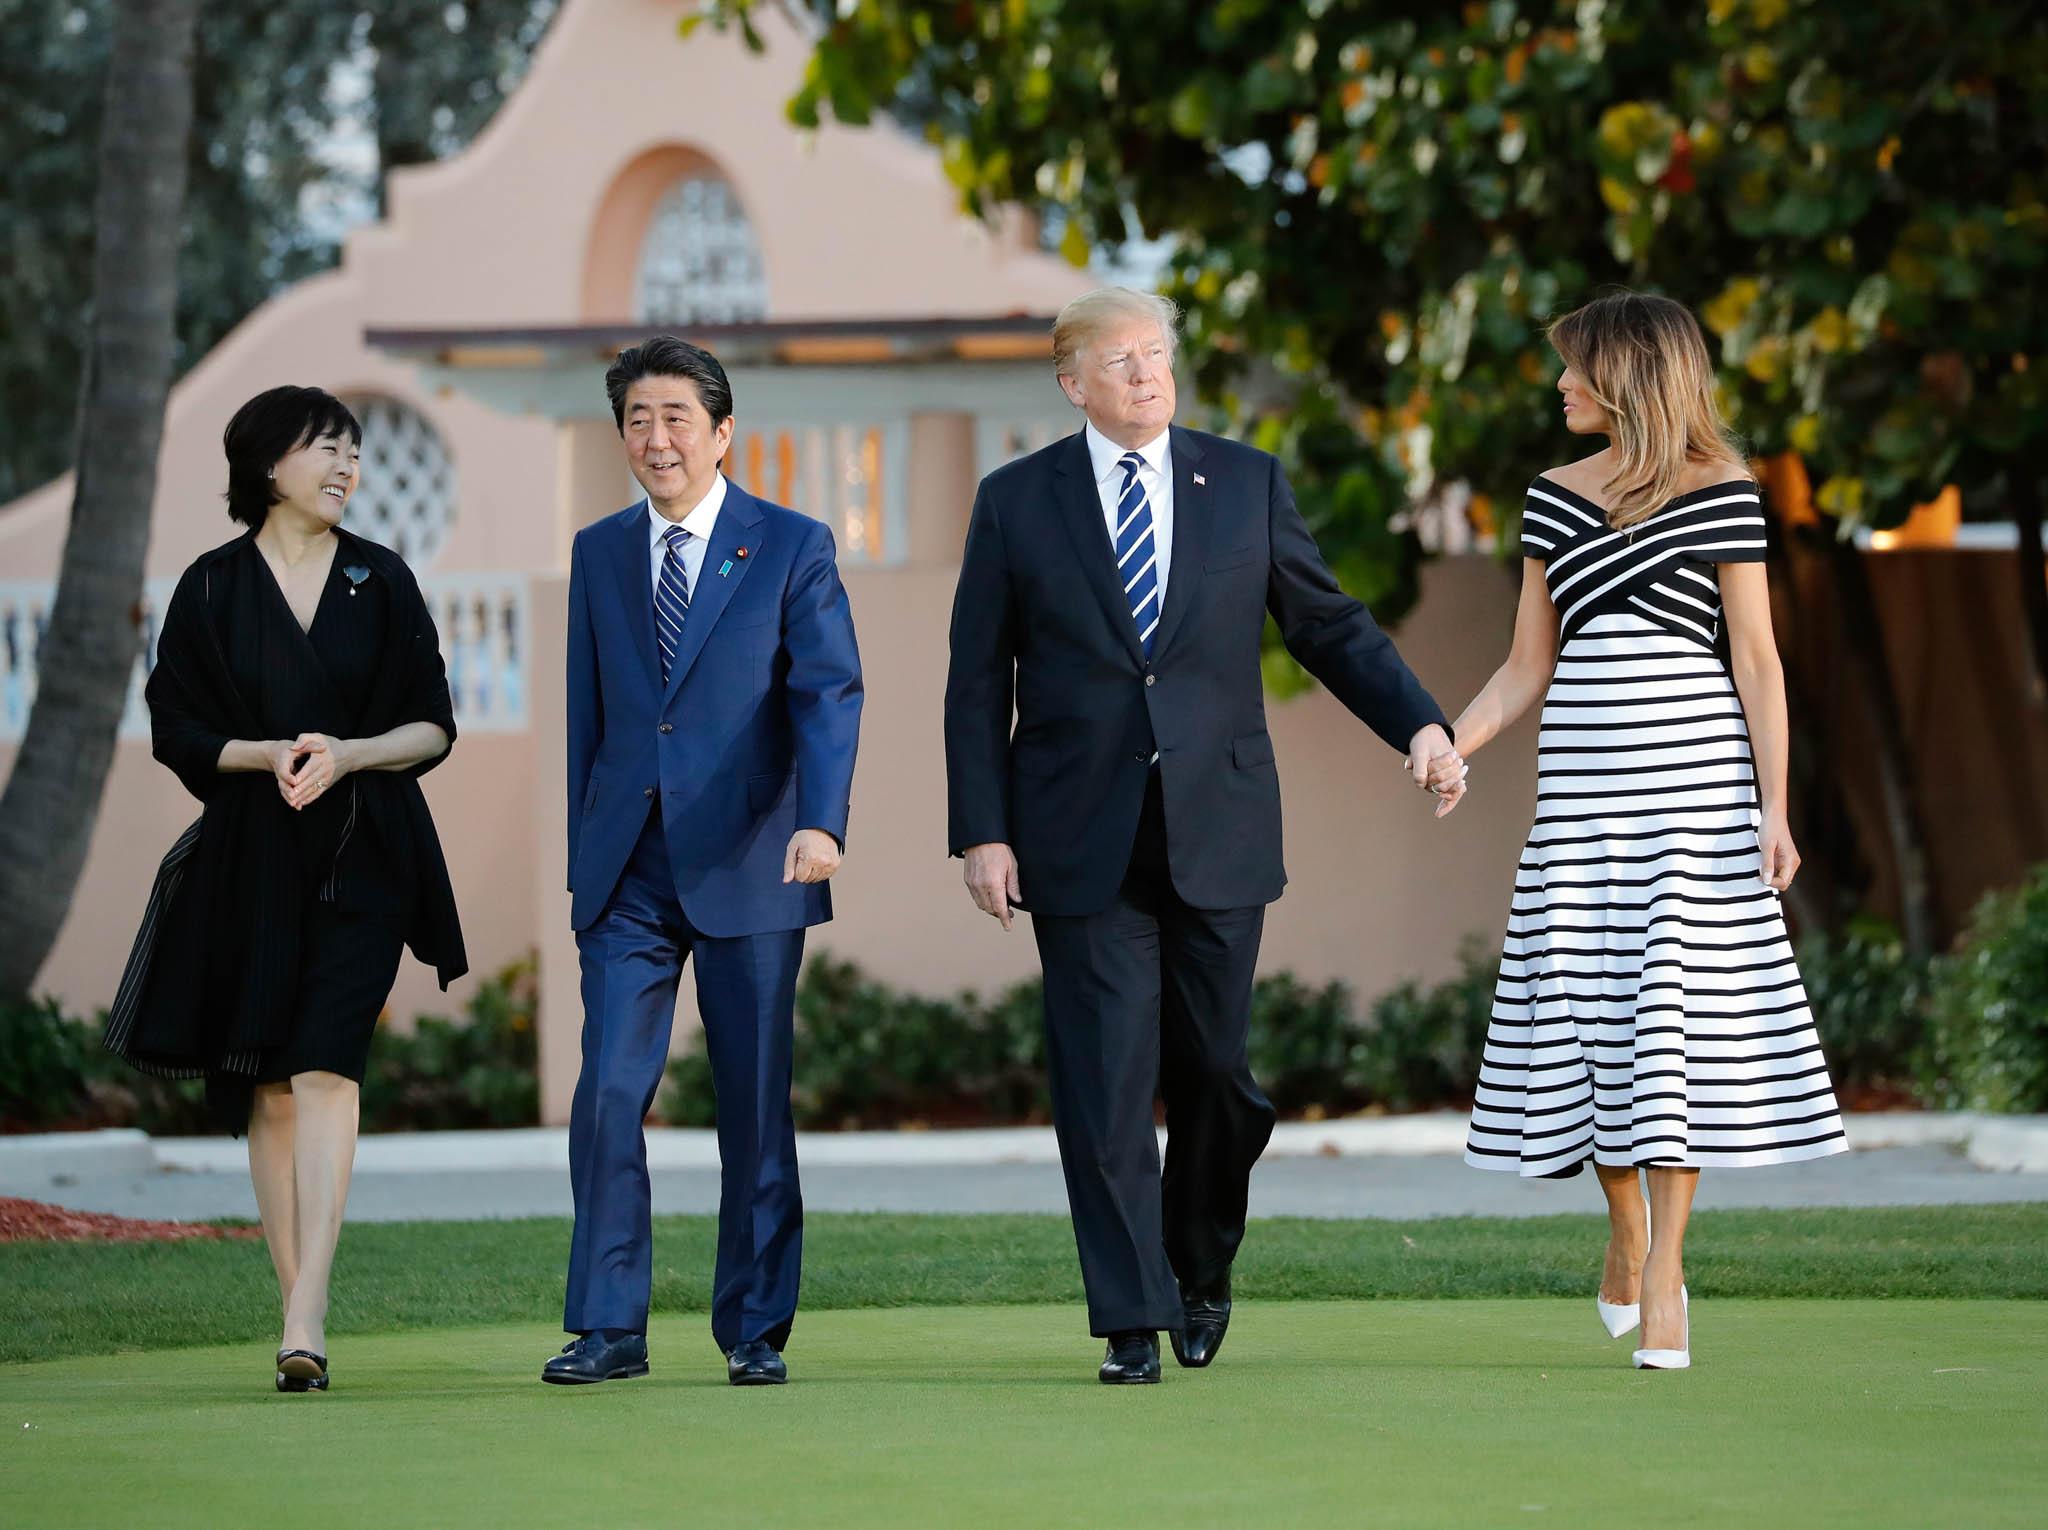 Akie Abe, Shinzō Abe, Donald Trump and Melania Trump walking on the lawn at Mar-a-Lago (© Pablo Martinez Monsivais/AP Images)